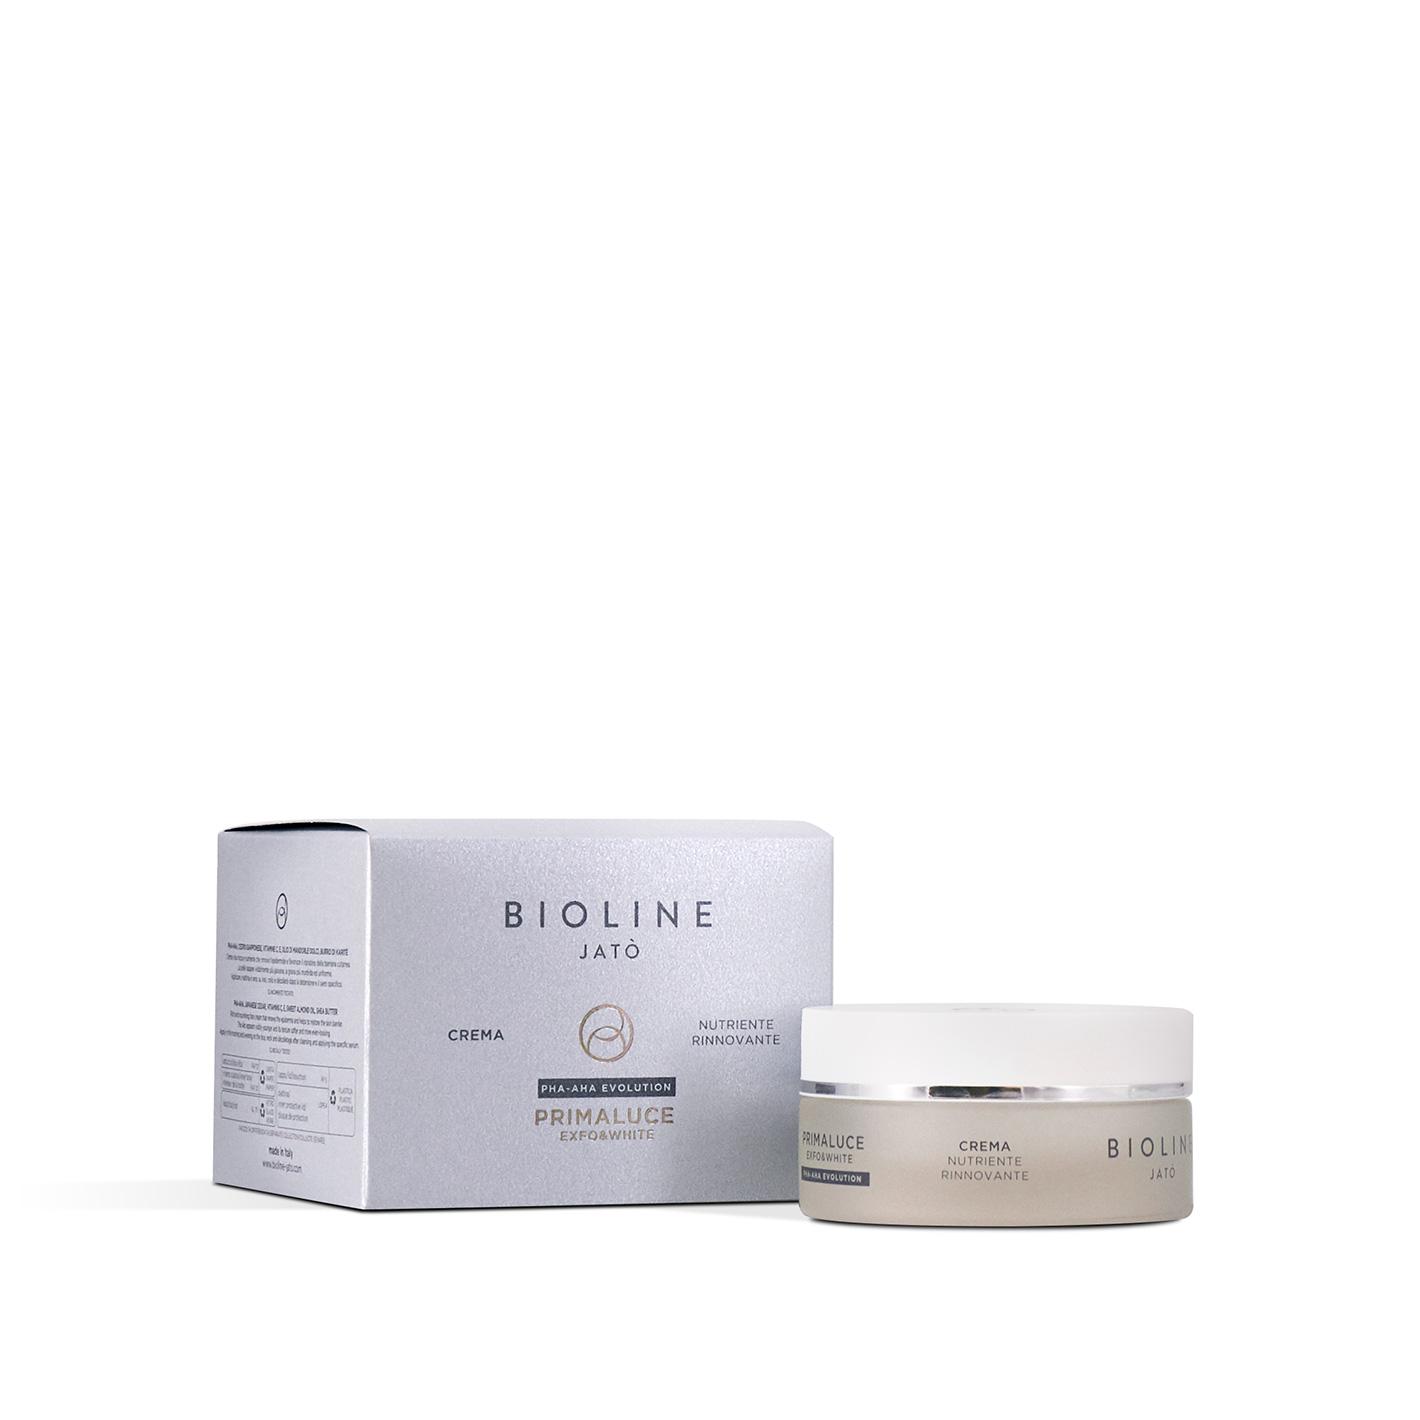 Primaluce Exfo&White - Cream Nourishing Renovating